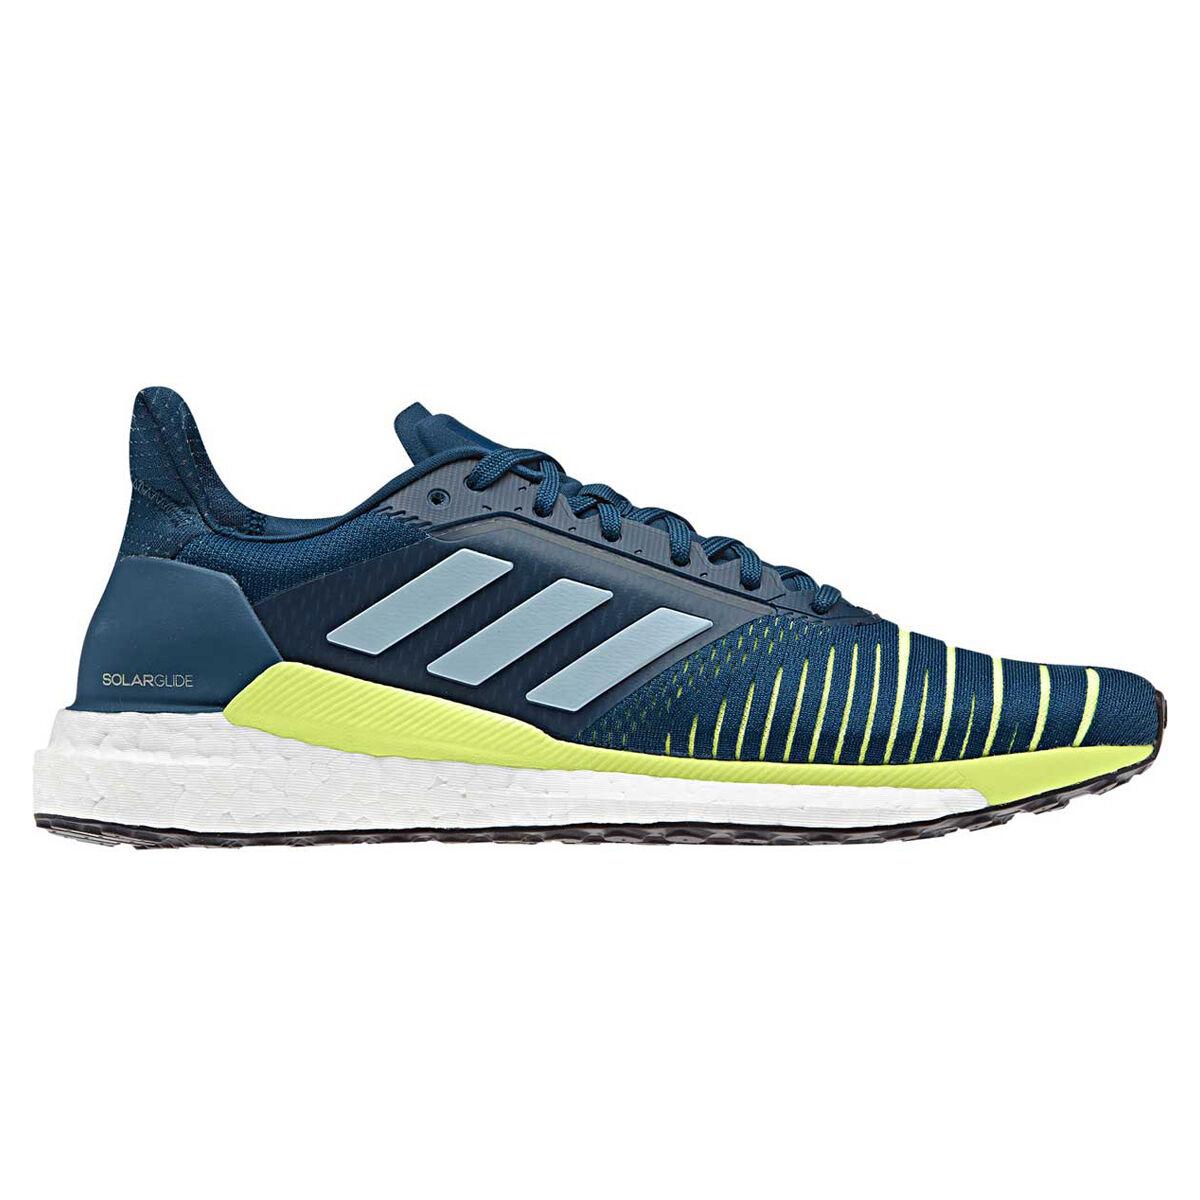 Clothing & Accessories Glorious Adidas Supernova Mens Running Jacket Full Zip Training Sports Coat Blue